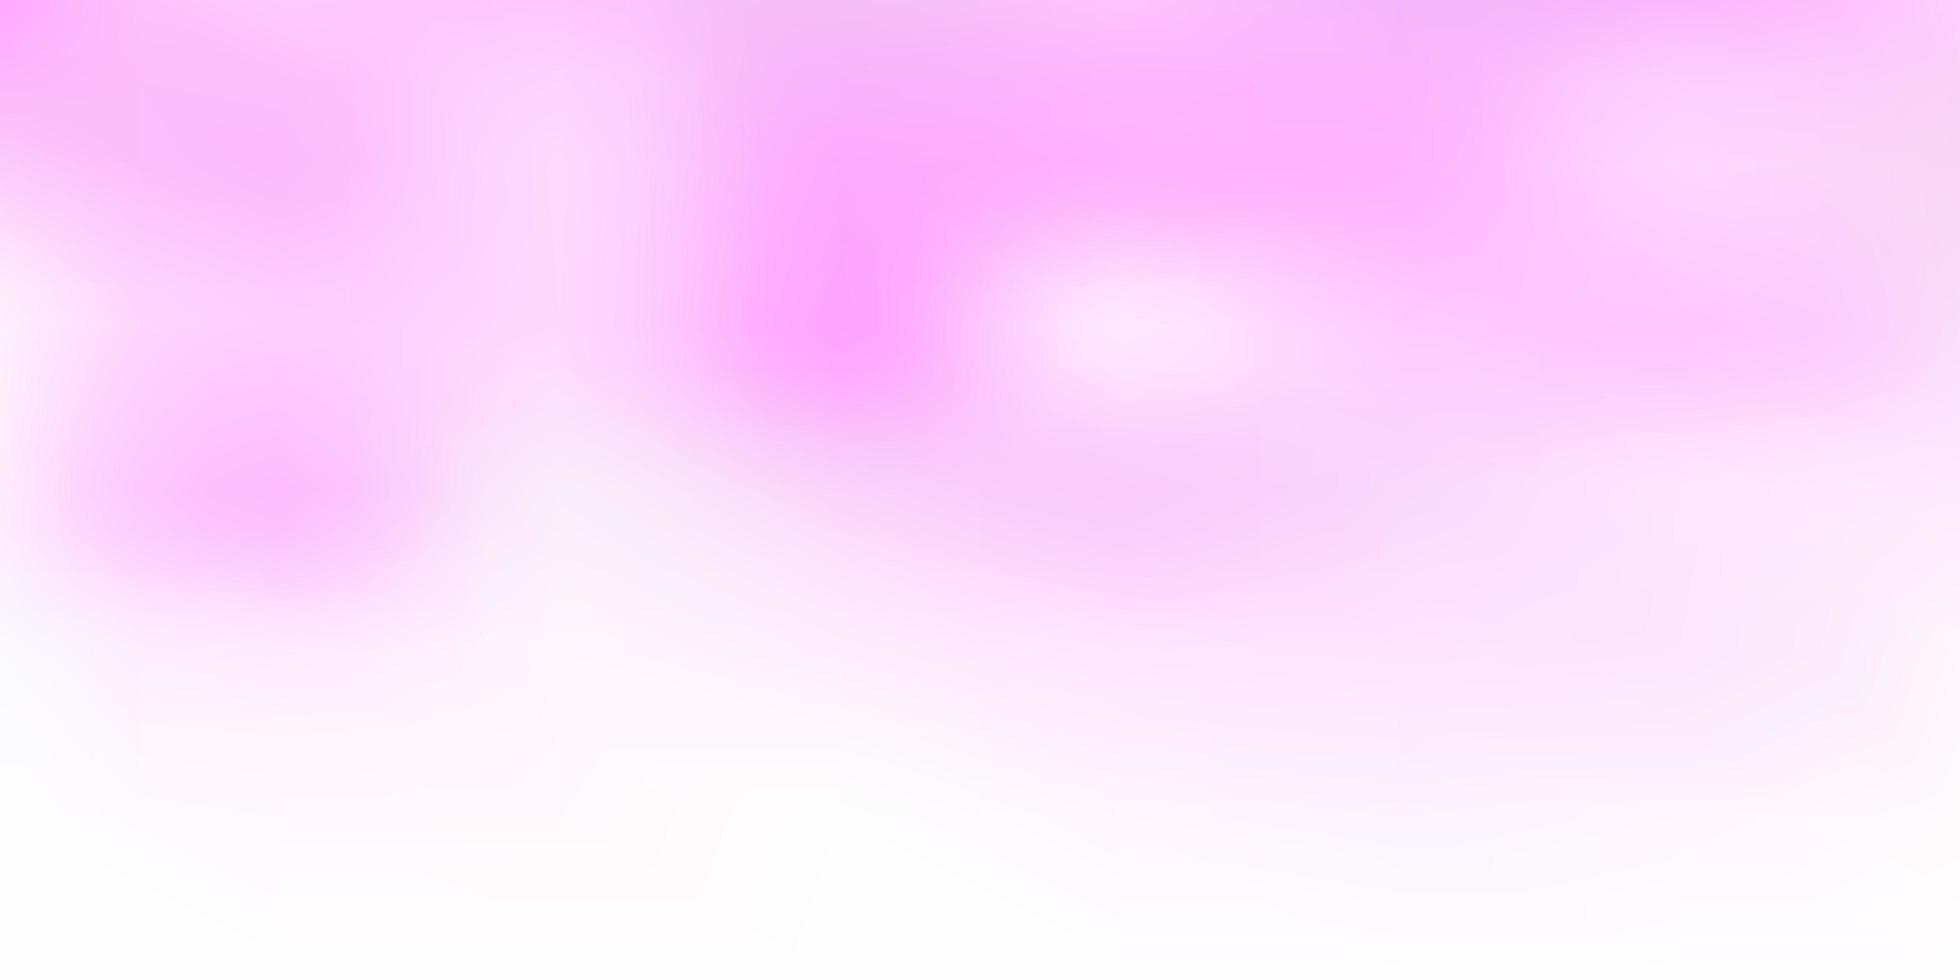 textura turva vector rosa claro.